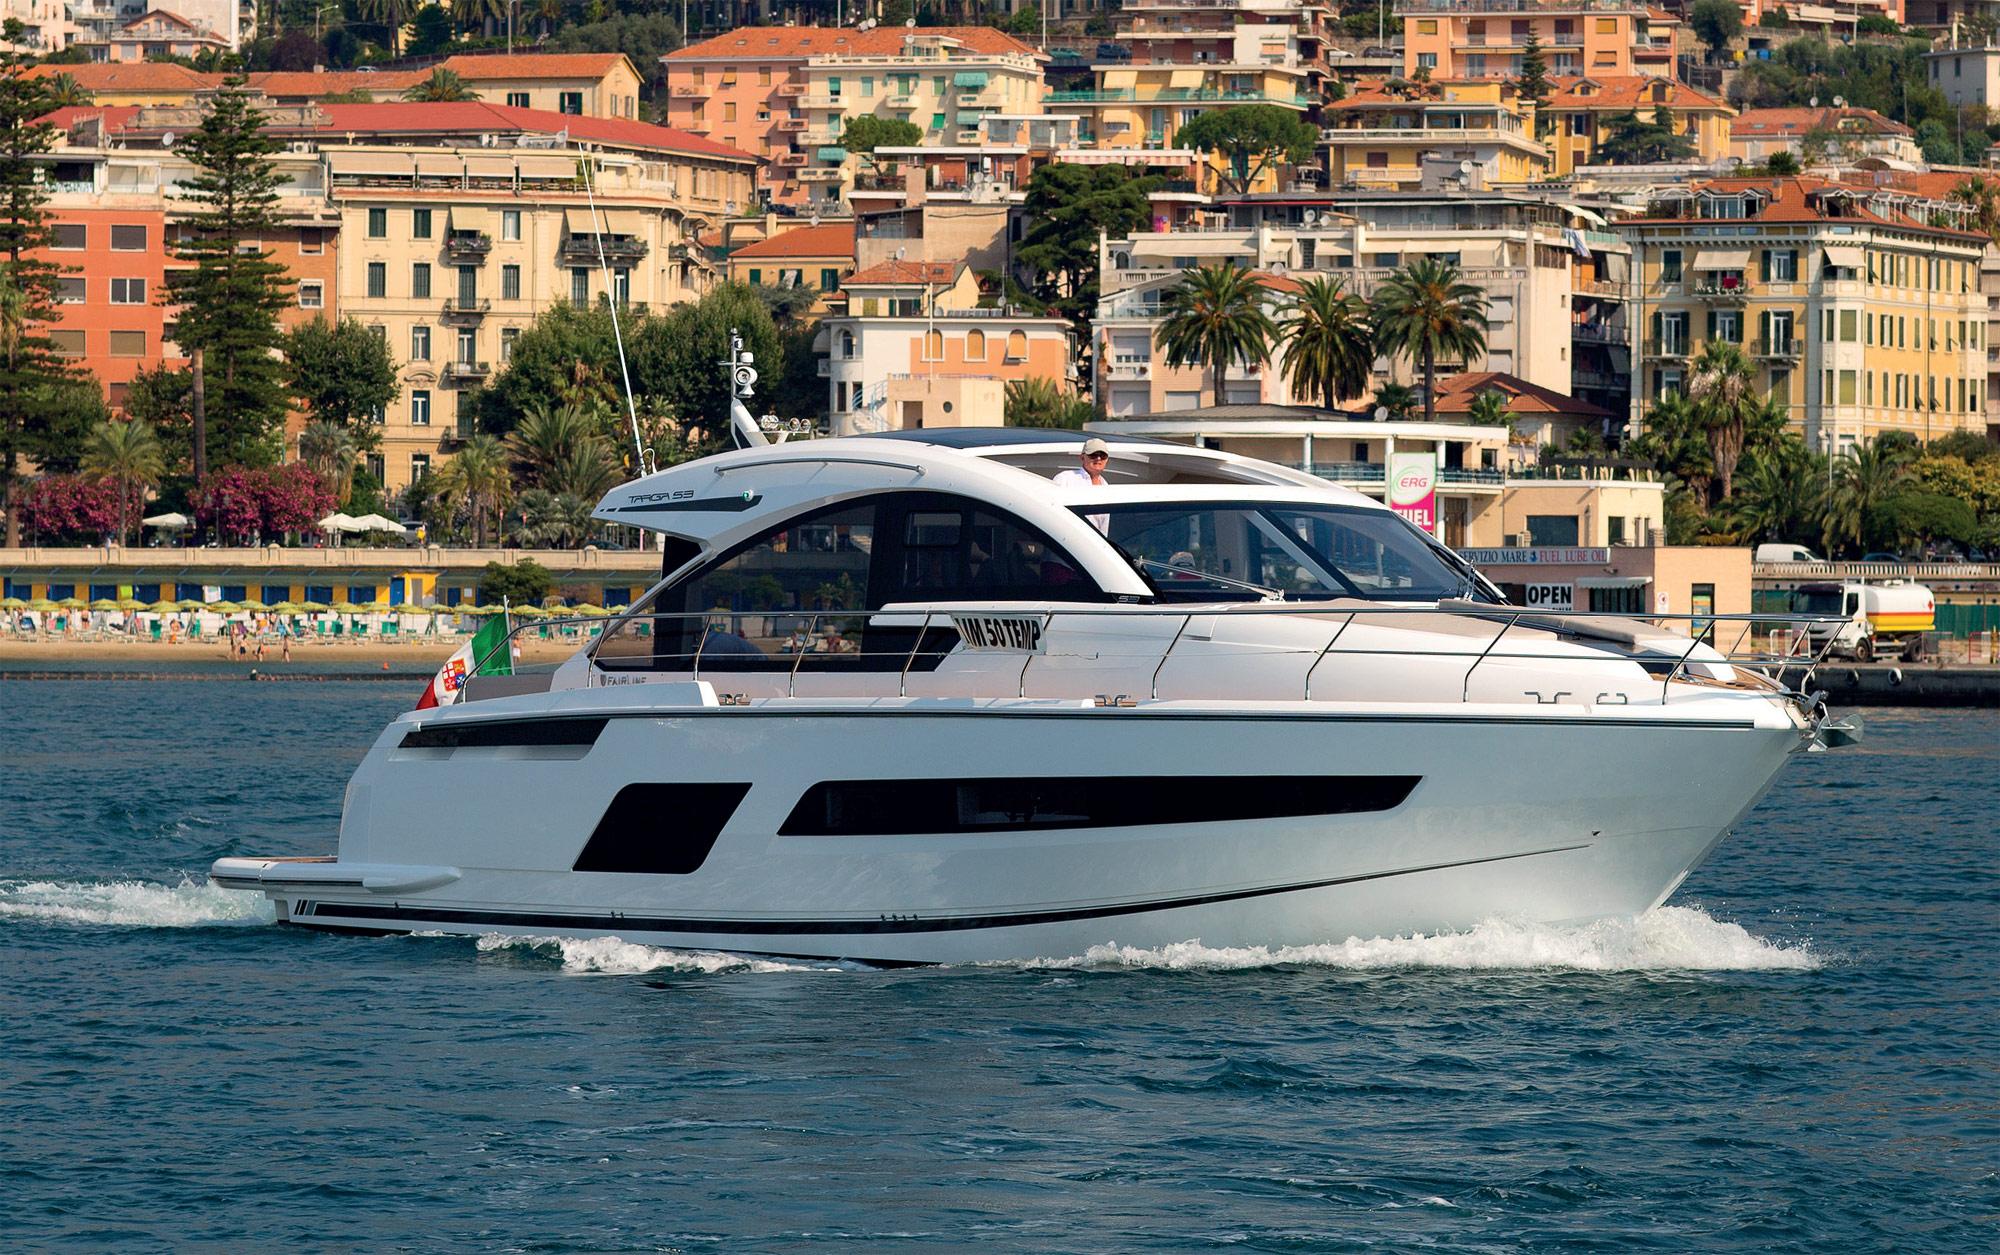 Zoë Bing, somewhere off the Italian Riviera, samples la dolce vita on a Targa 53 GT